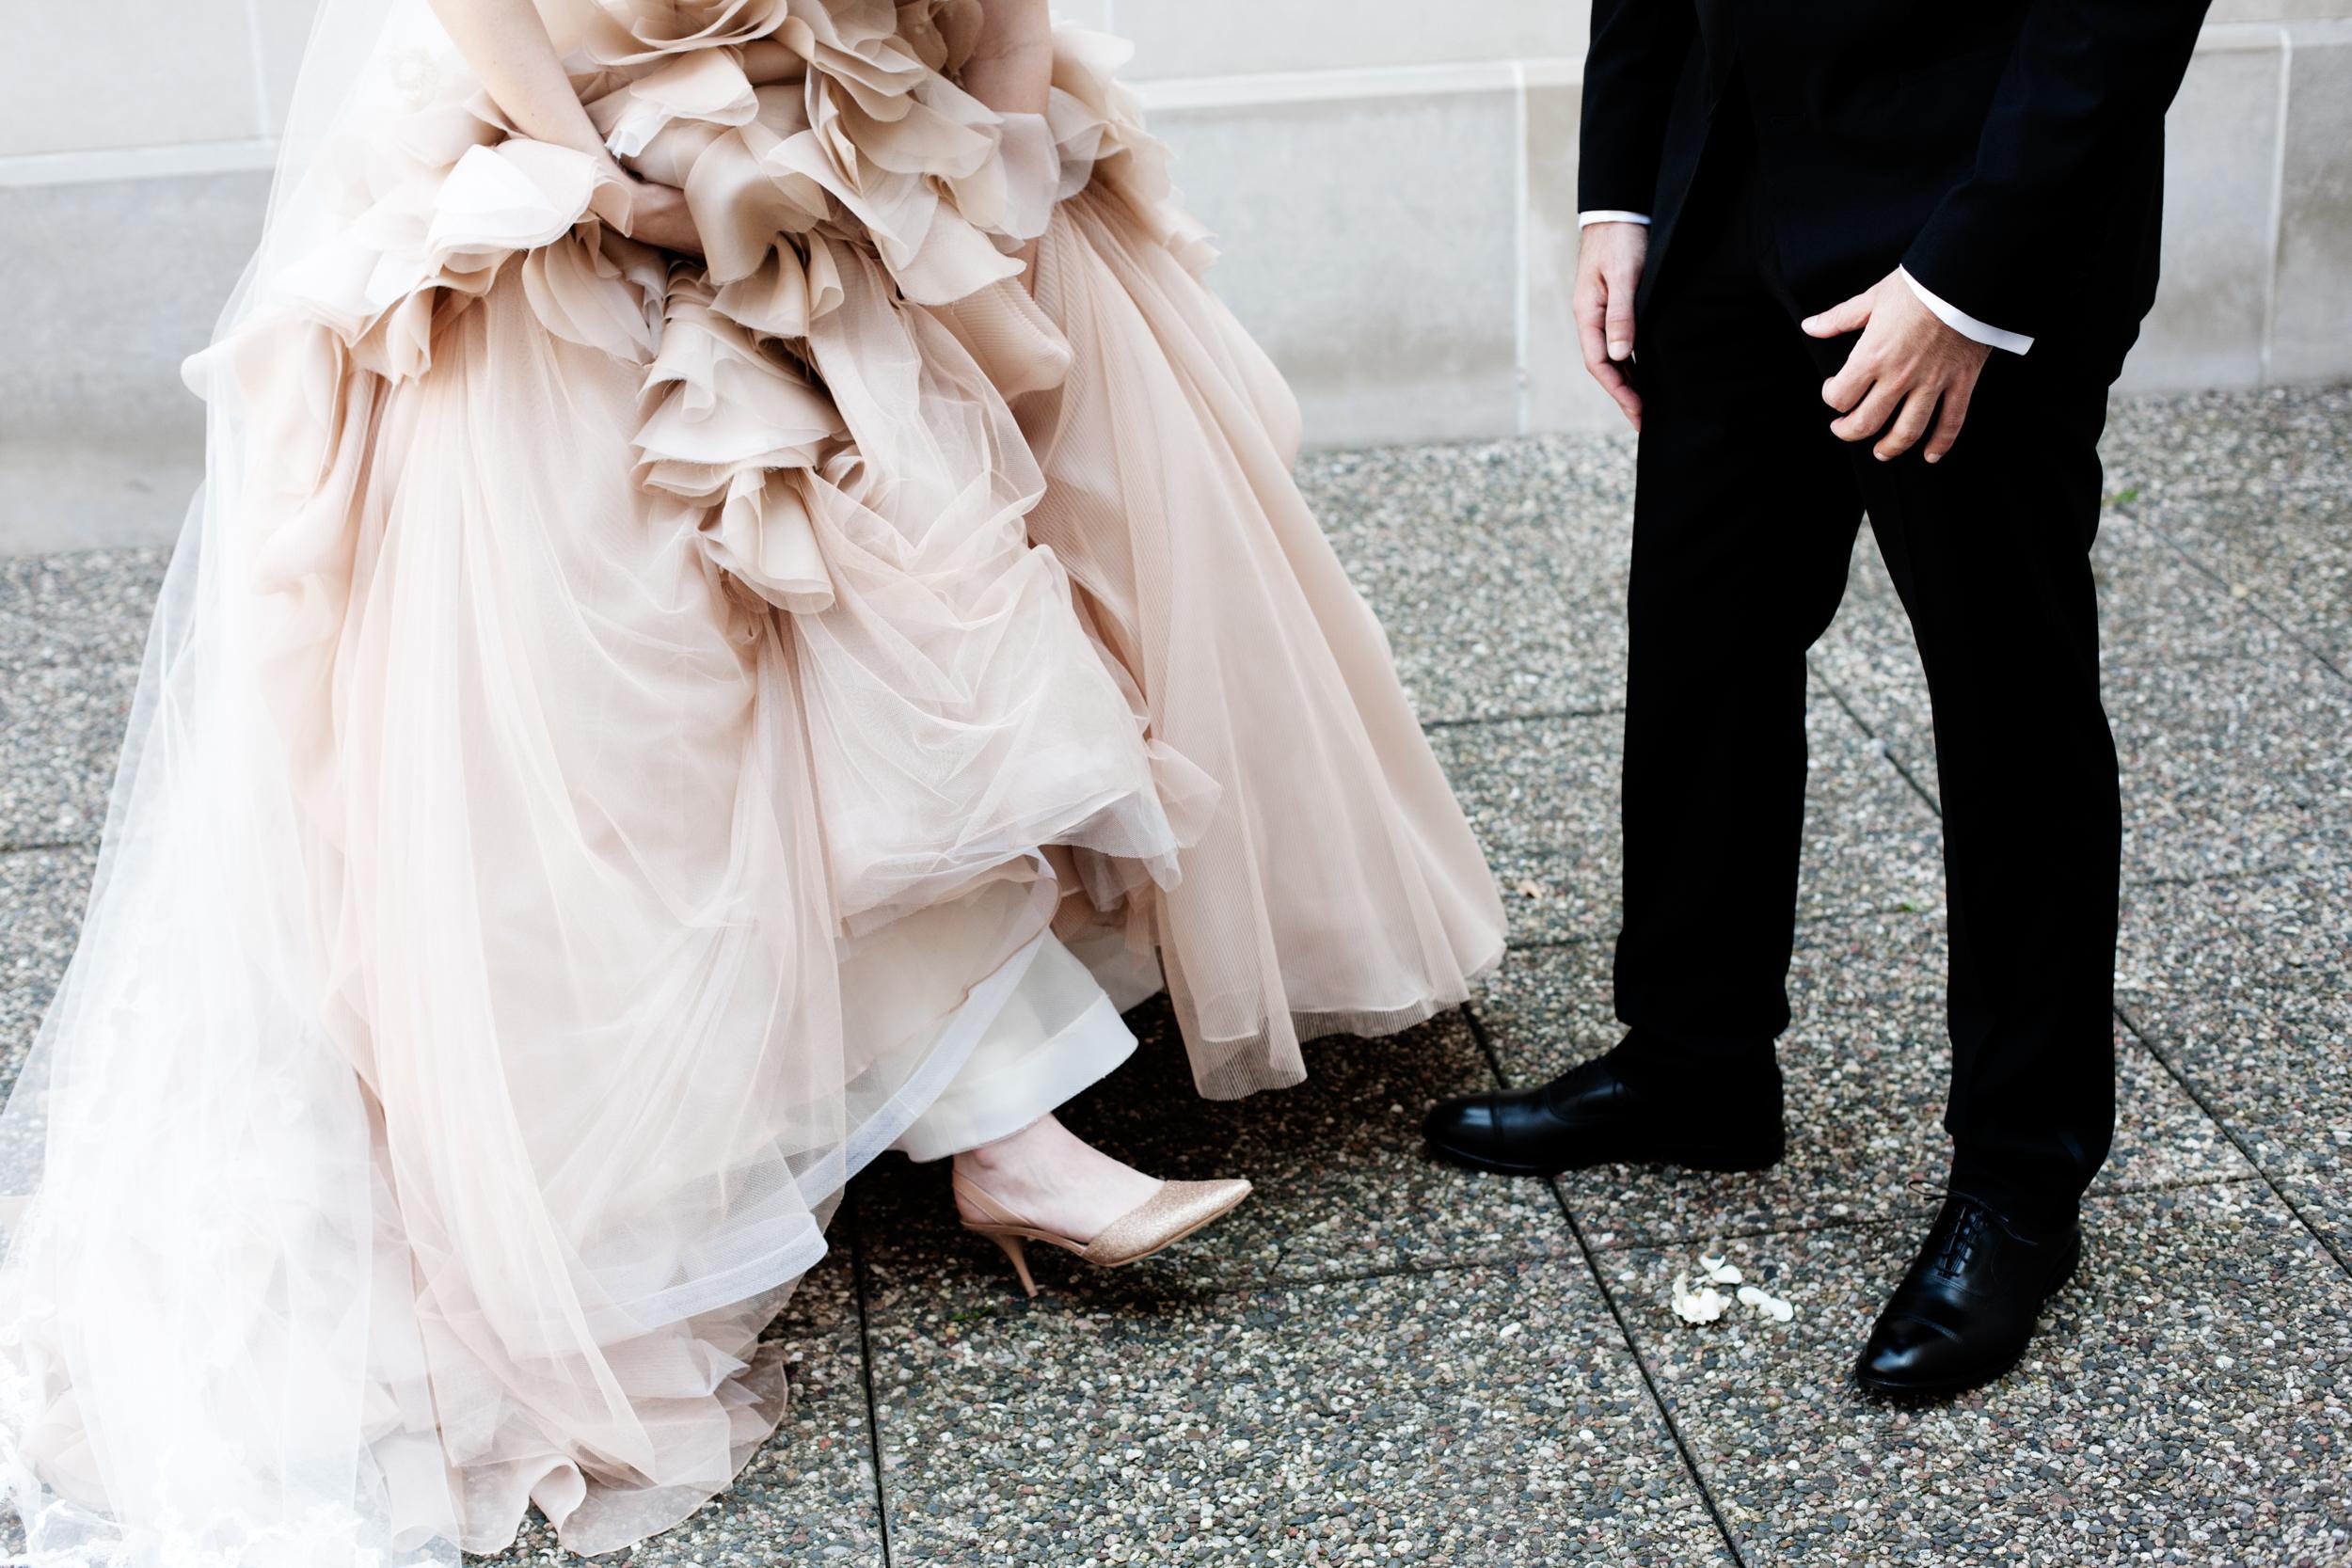 Ceci_New_York_Ceci_Style_Ceci_Johnson_Luxury_Lifestyle_Floral_Lace_Wedding_Letterpress_Inspiration_Design_Custom_Couture_Personalized_Invitations_-43.jpg